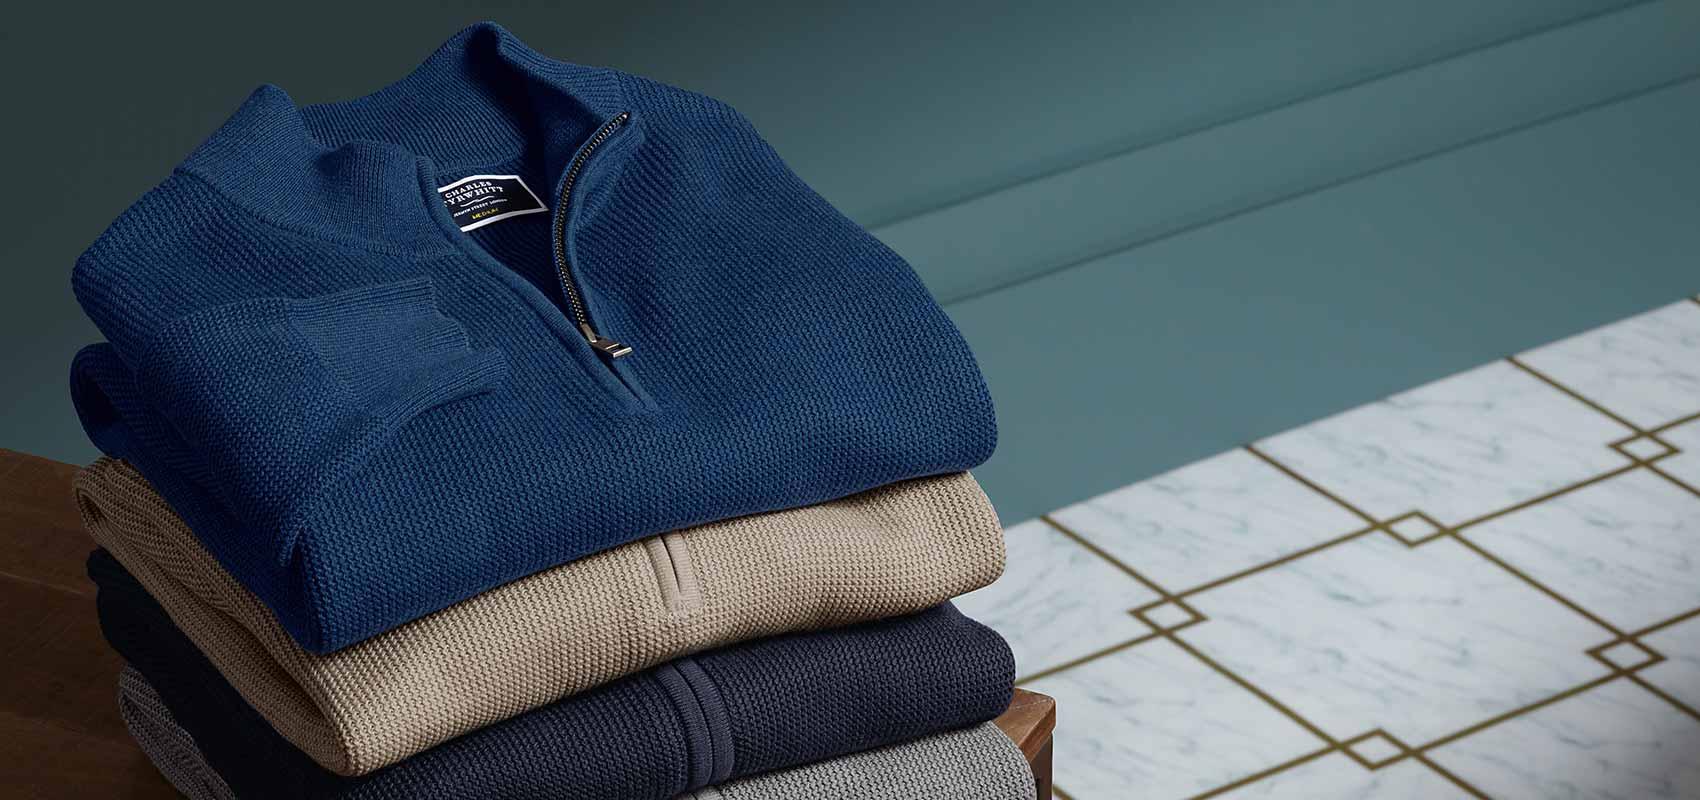 Pima cotton knitwear